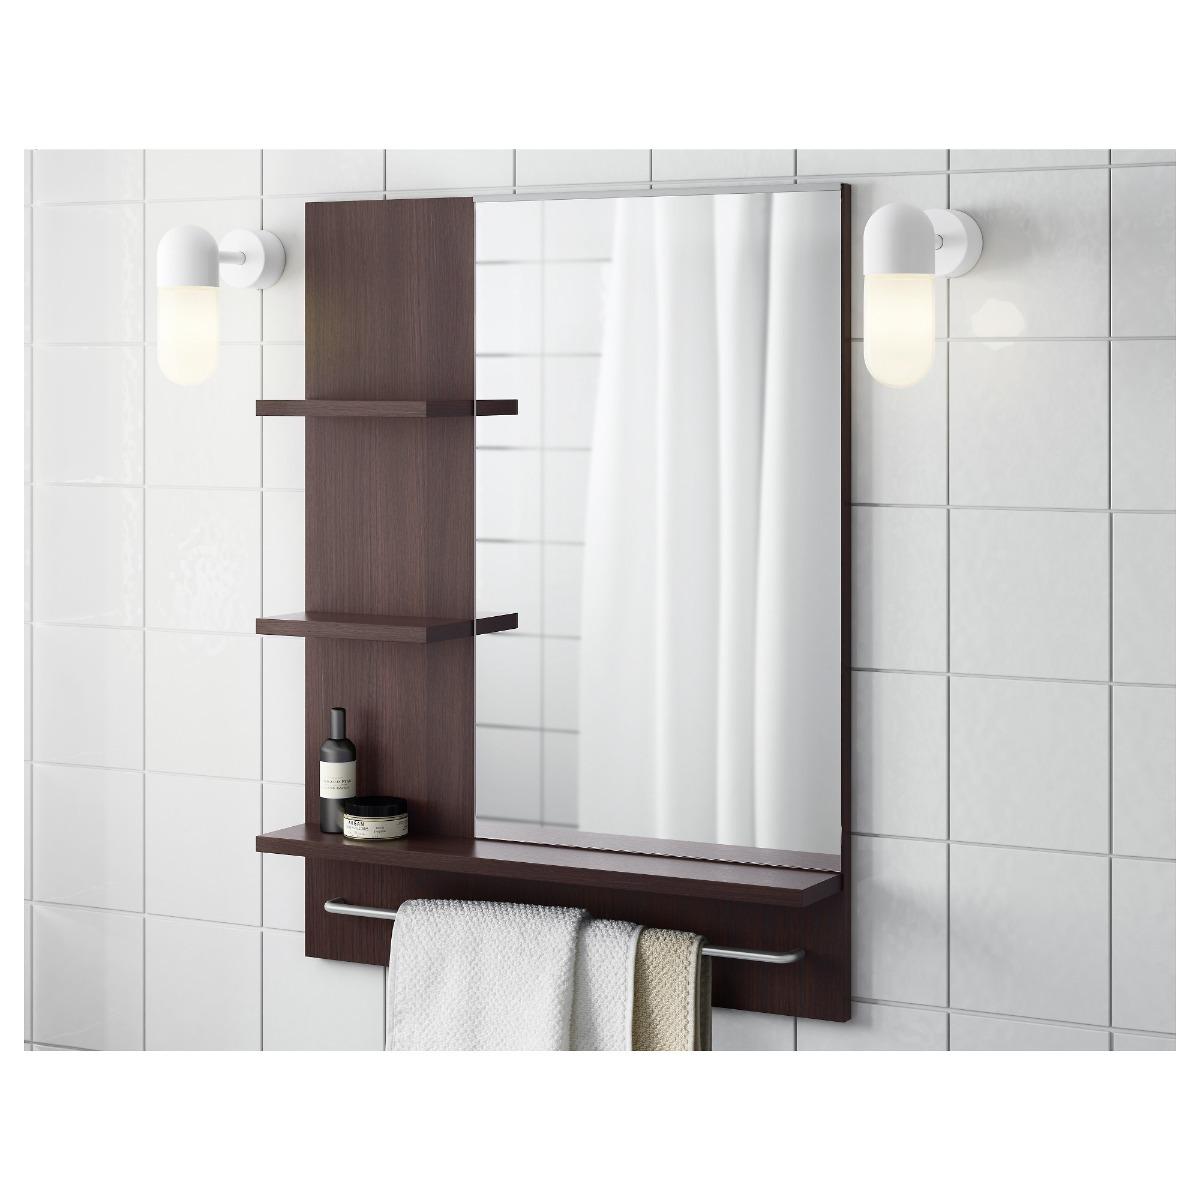 Botiquin ba o tipo espejo en mercado libre for Mueble botiquin bano